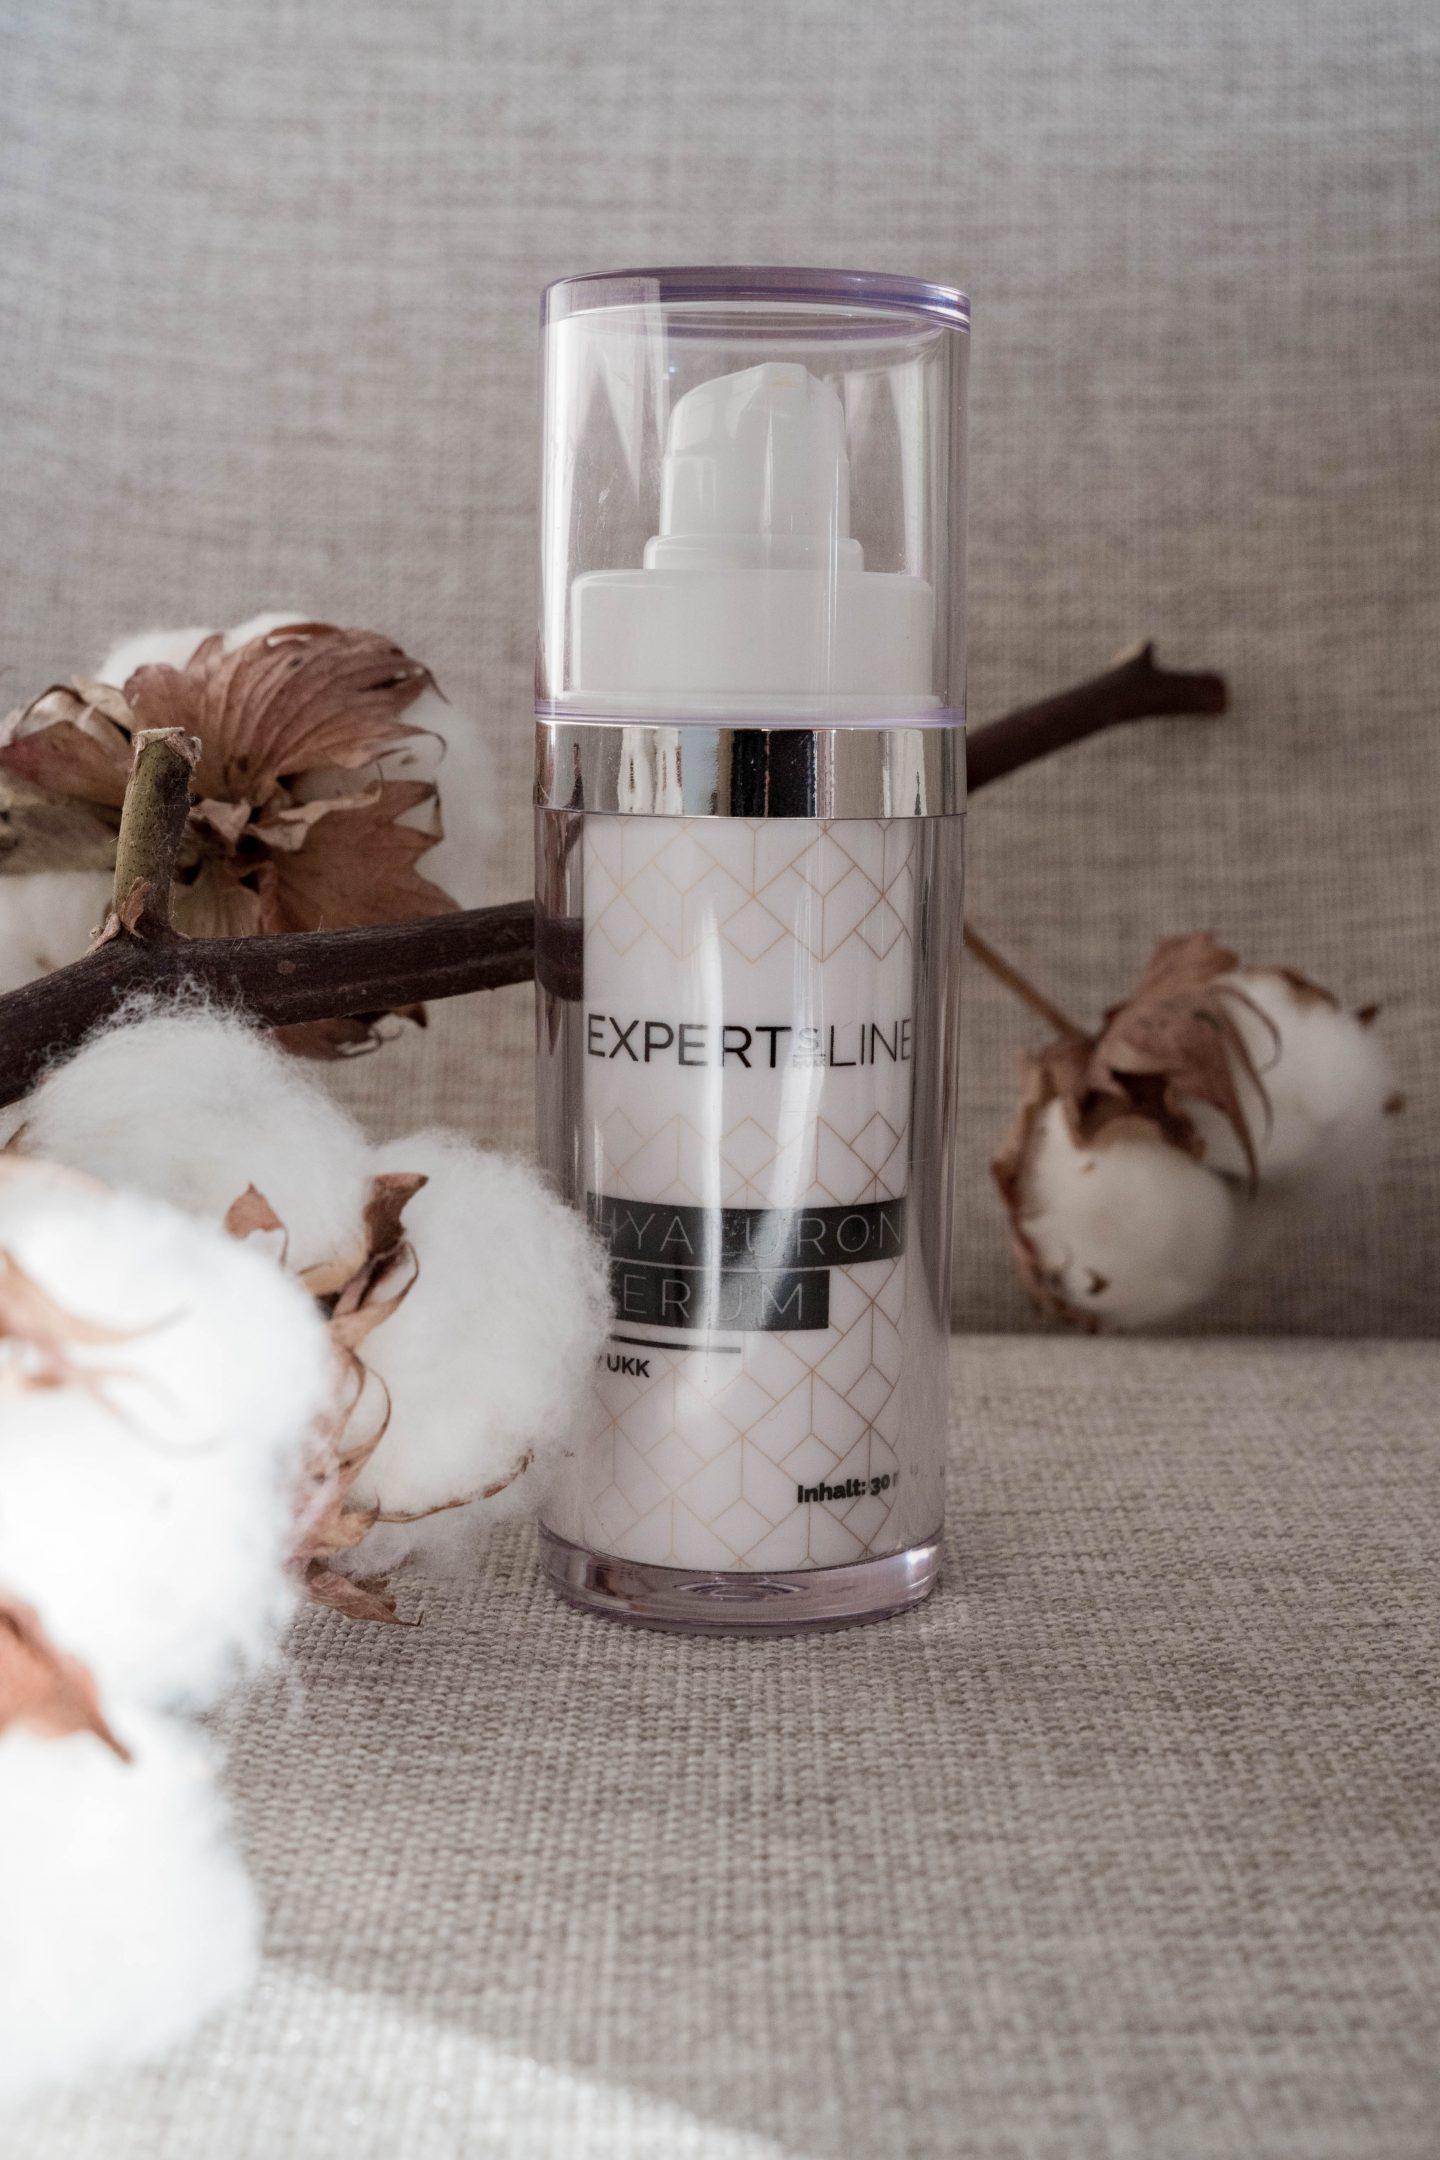 Beautyblog - Veralice - beste Anti-Aging Produkte - beste Inhaltsstoffe - Hyaluronserum - AHA - Argireline - Beta Glucan - Nowshine